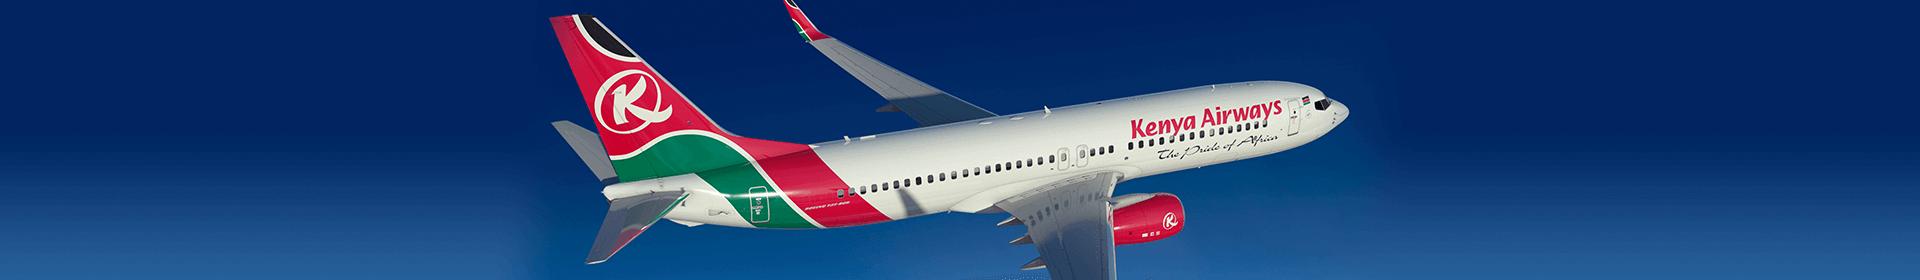 Kenya Airways Moves Terminals In Guangzhou Airport